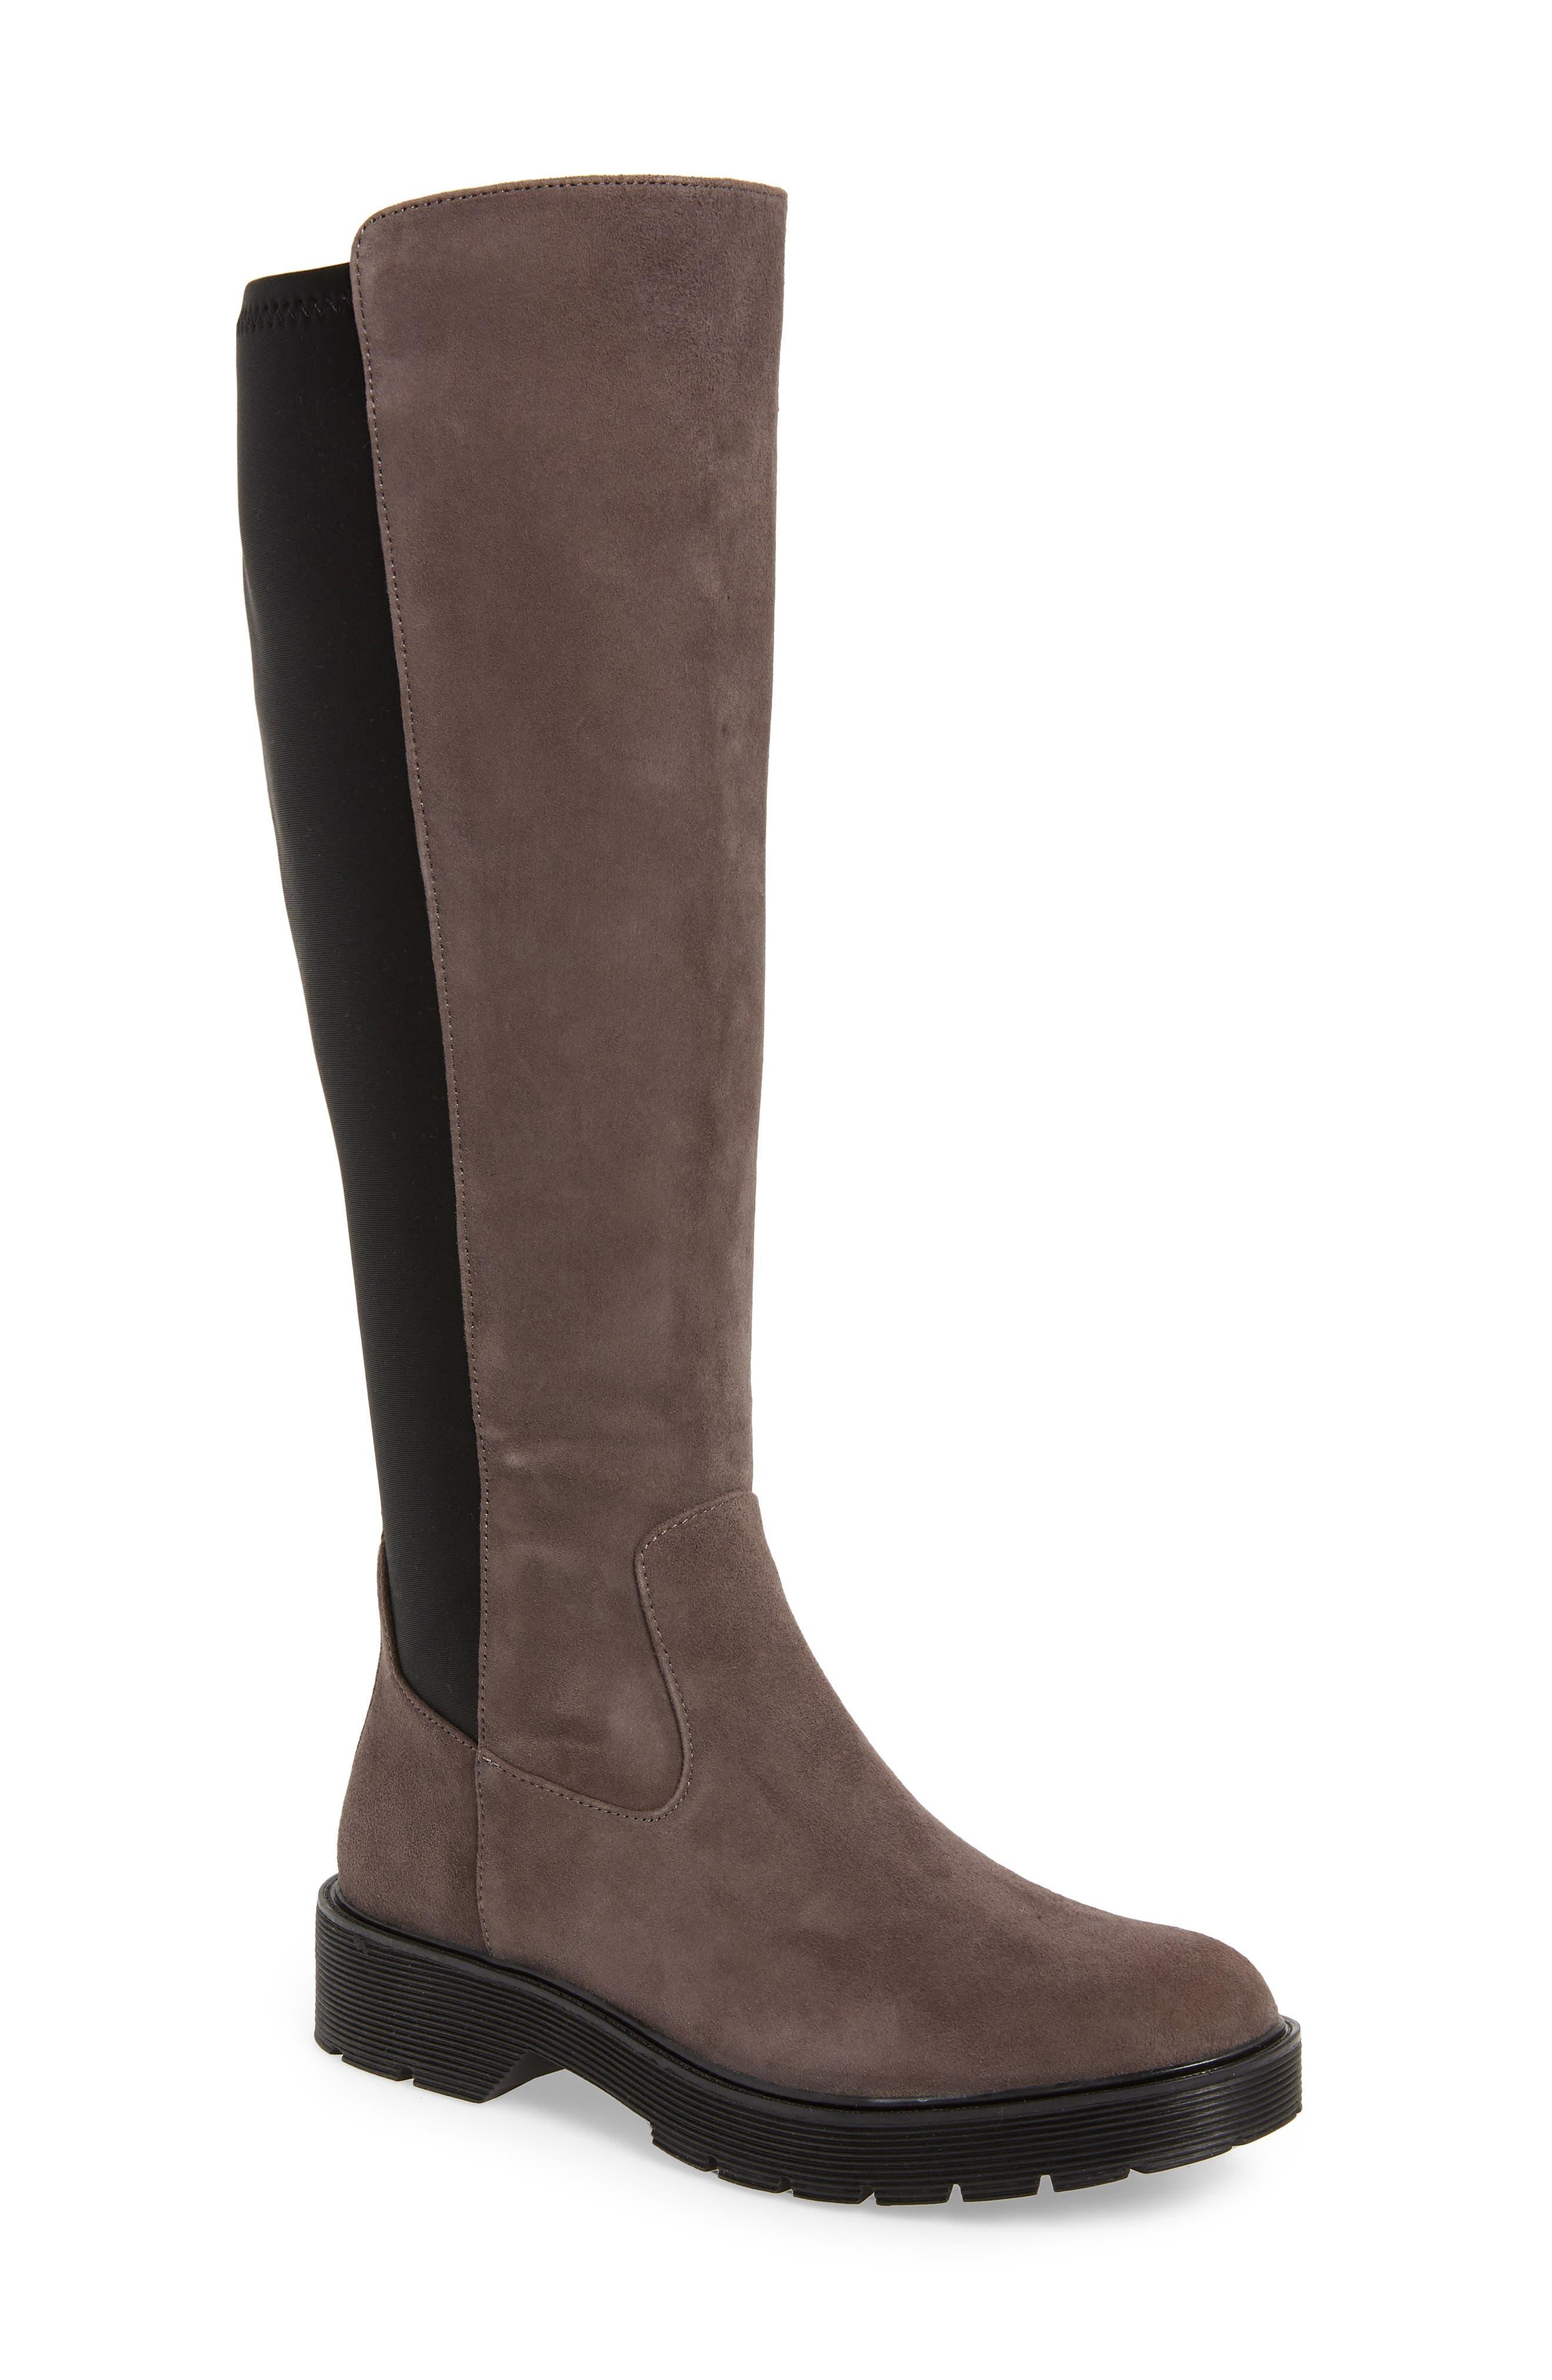 Calvin Klein Themis Knee High Riding Boot, Grey